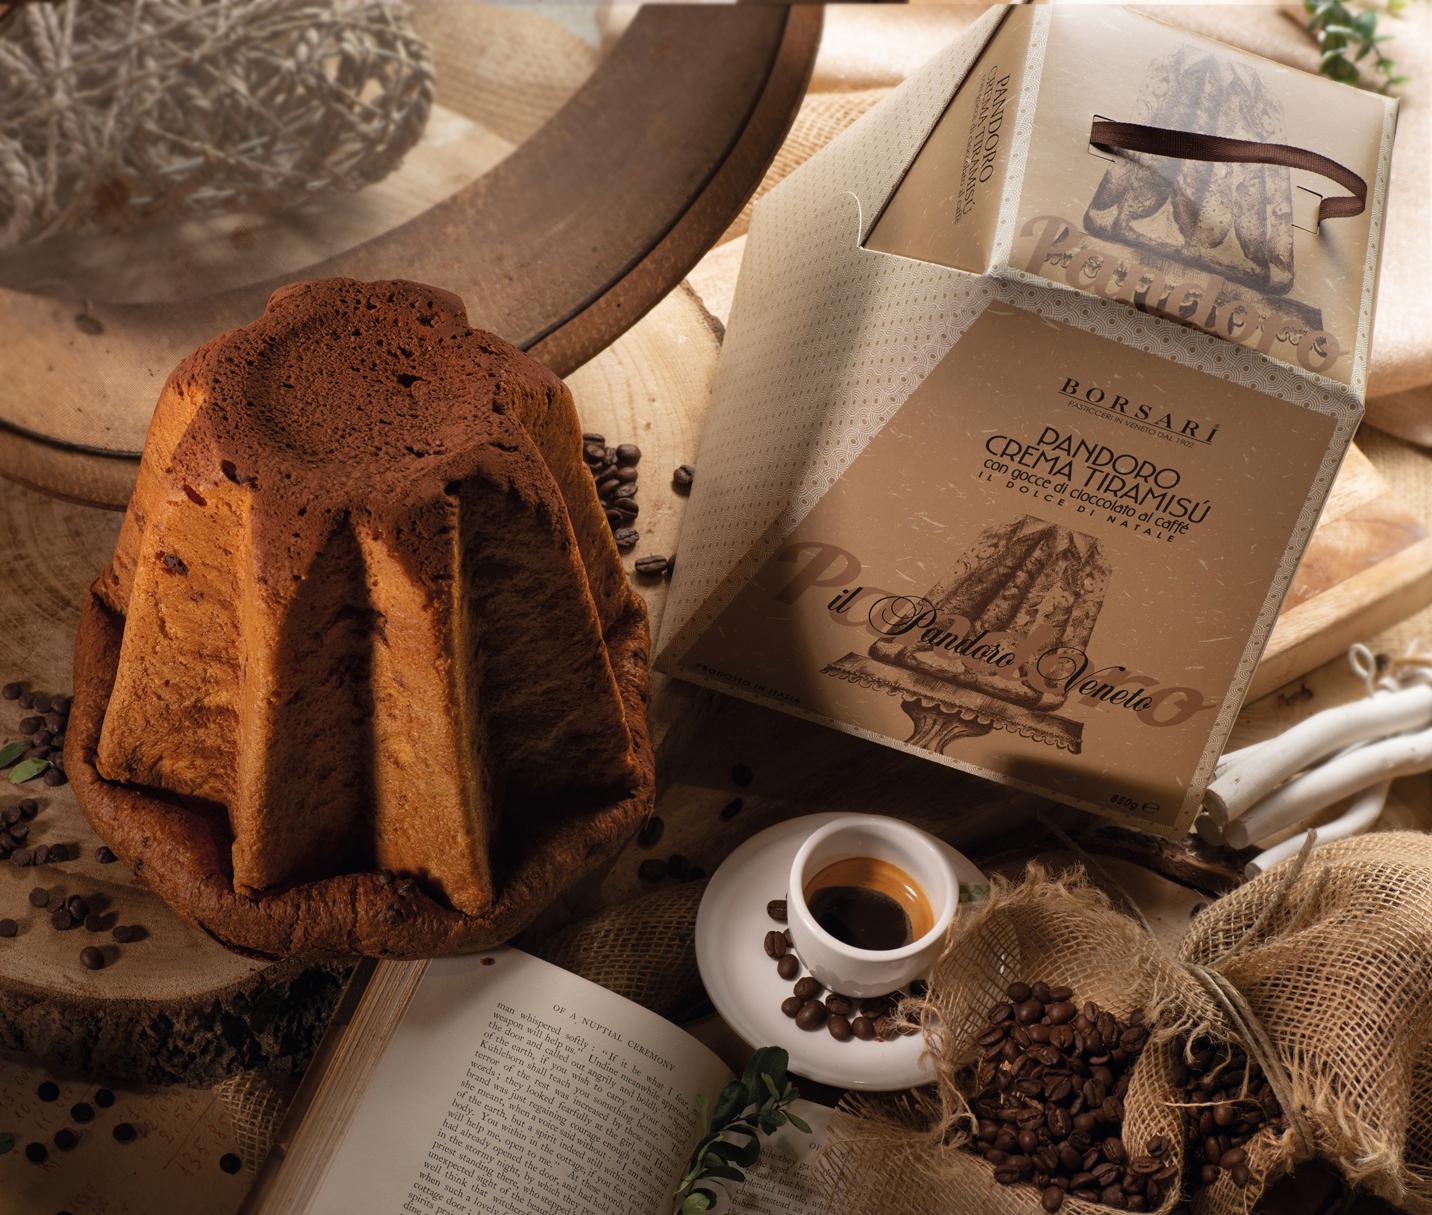 Pandoro Rustico Borsari Natale Astuccio Tiramisu Gocce cioccolato